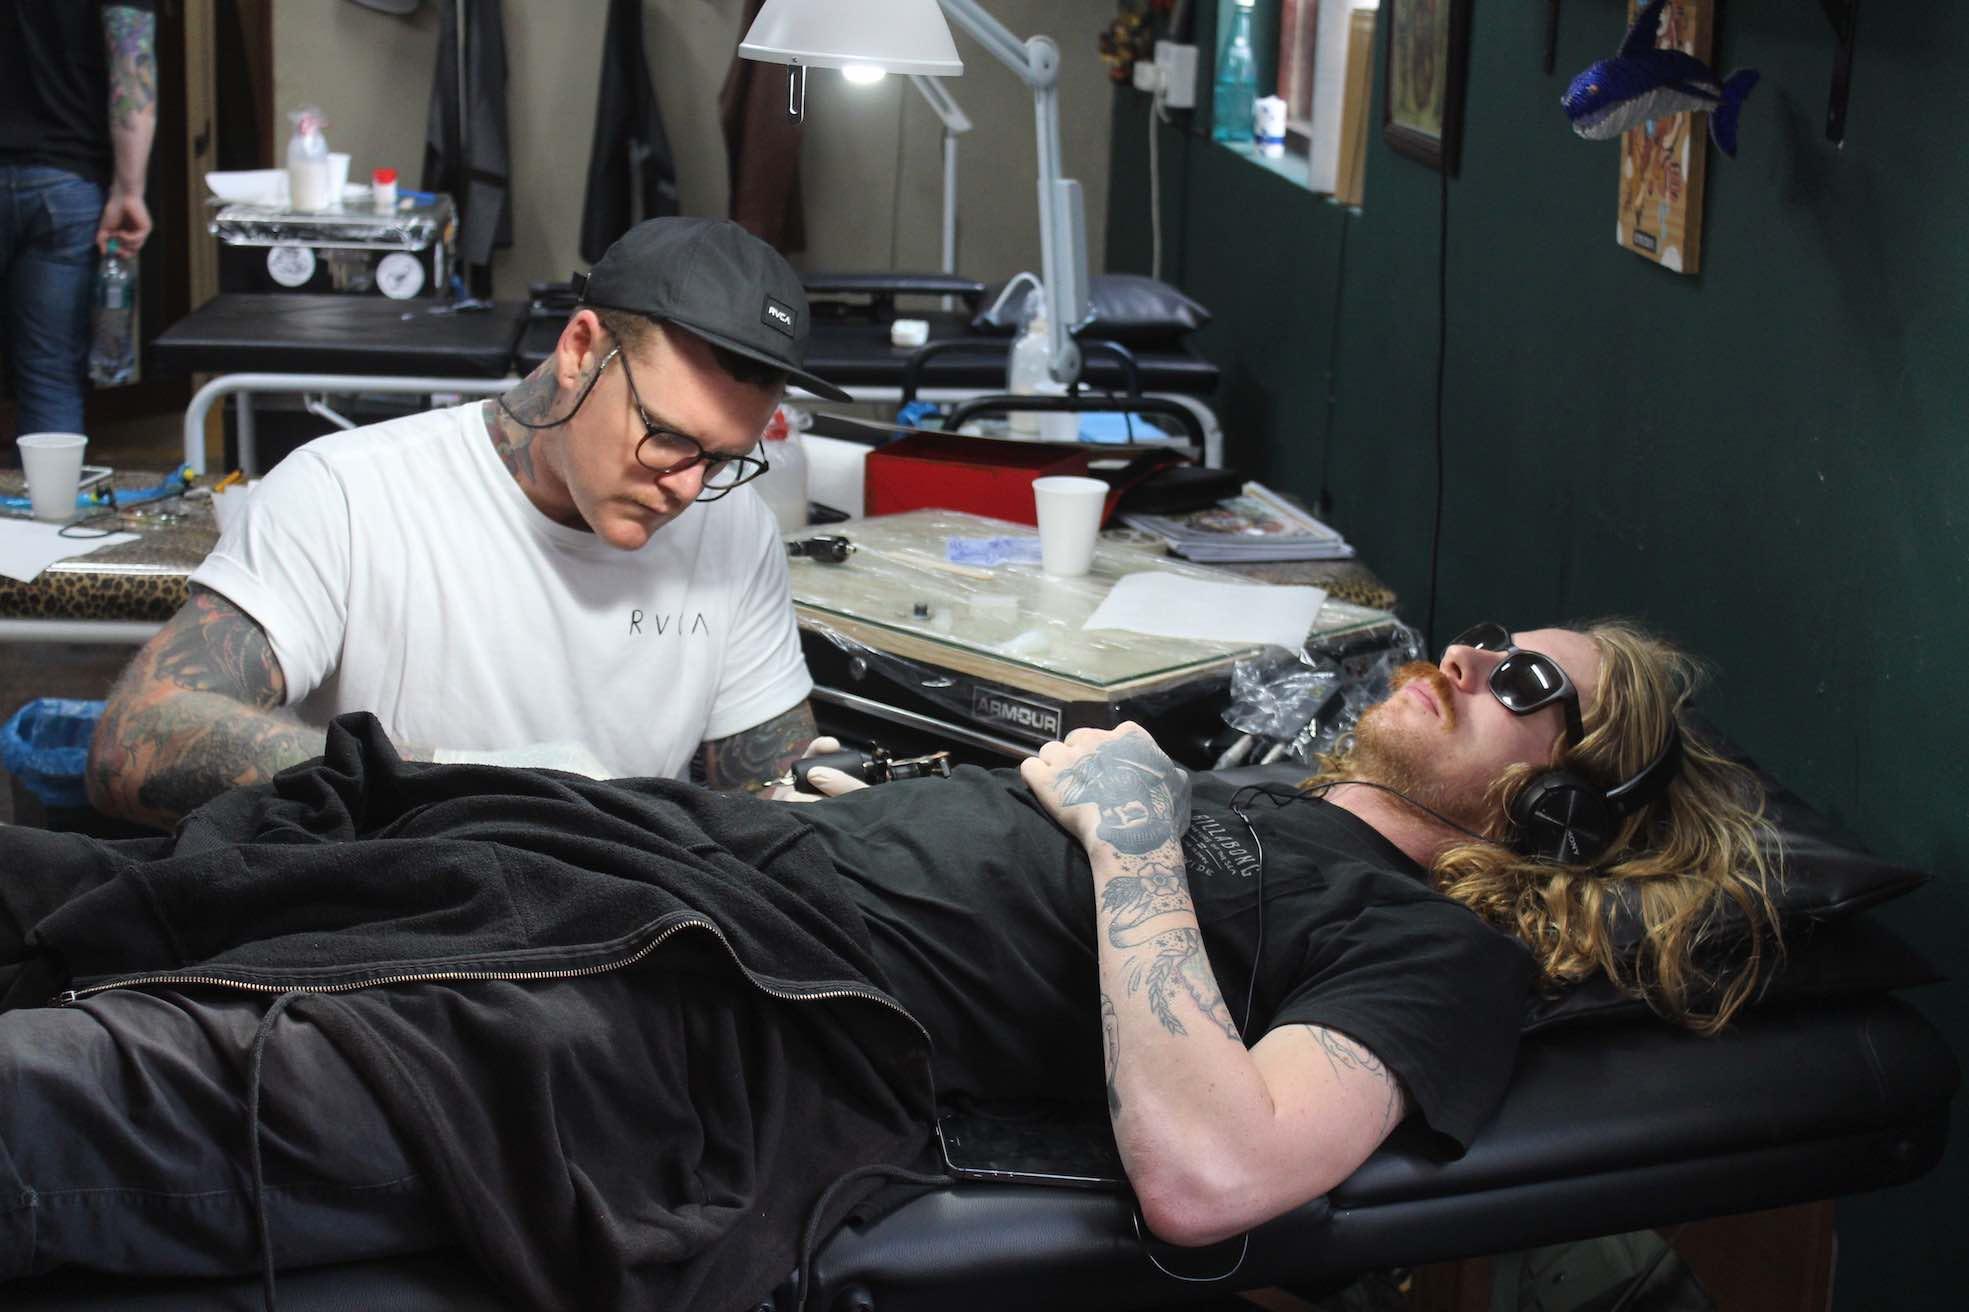 Wesley von Blerk tattooing a client at Handstyle 7th Street tattoos